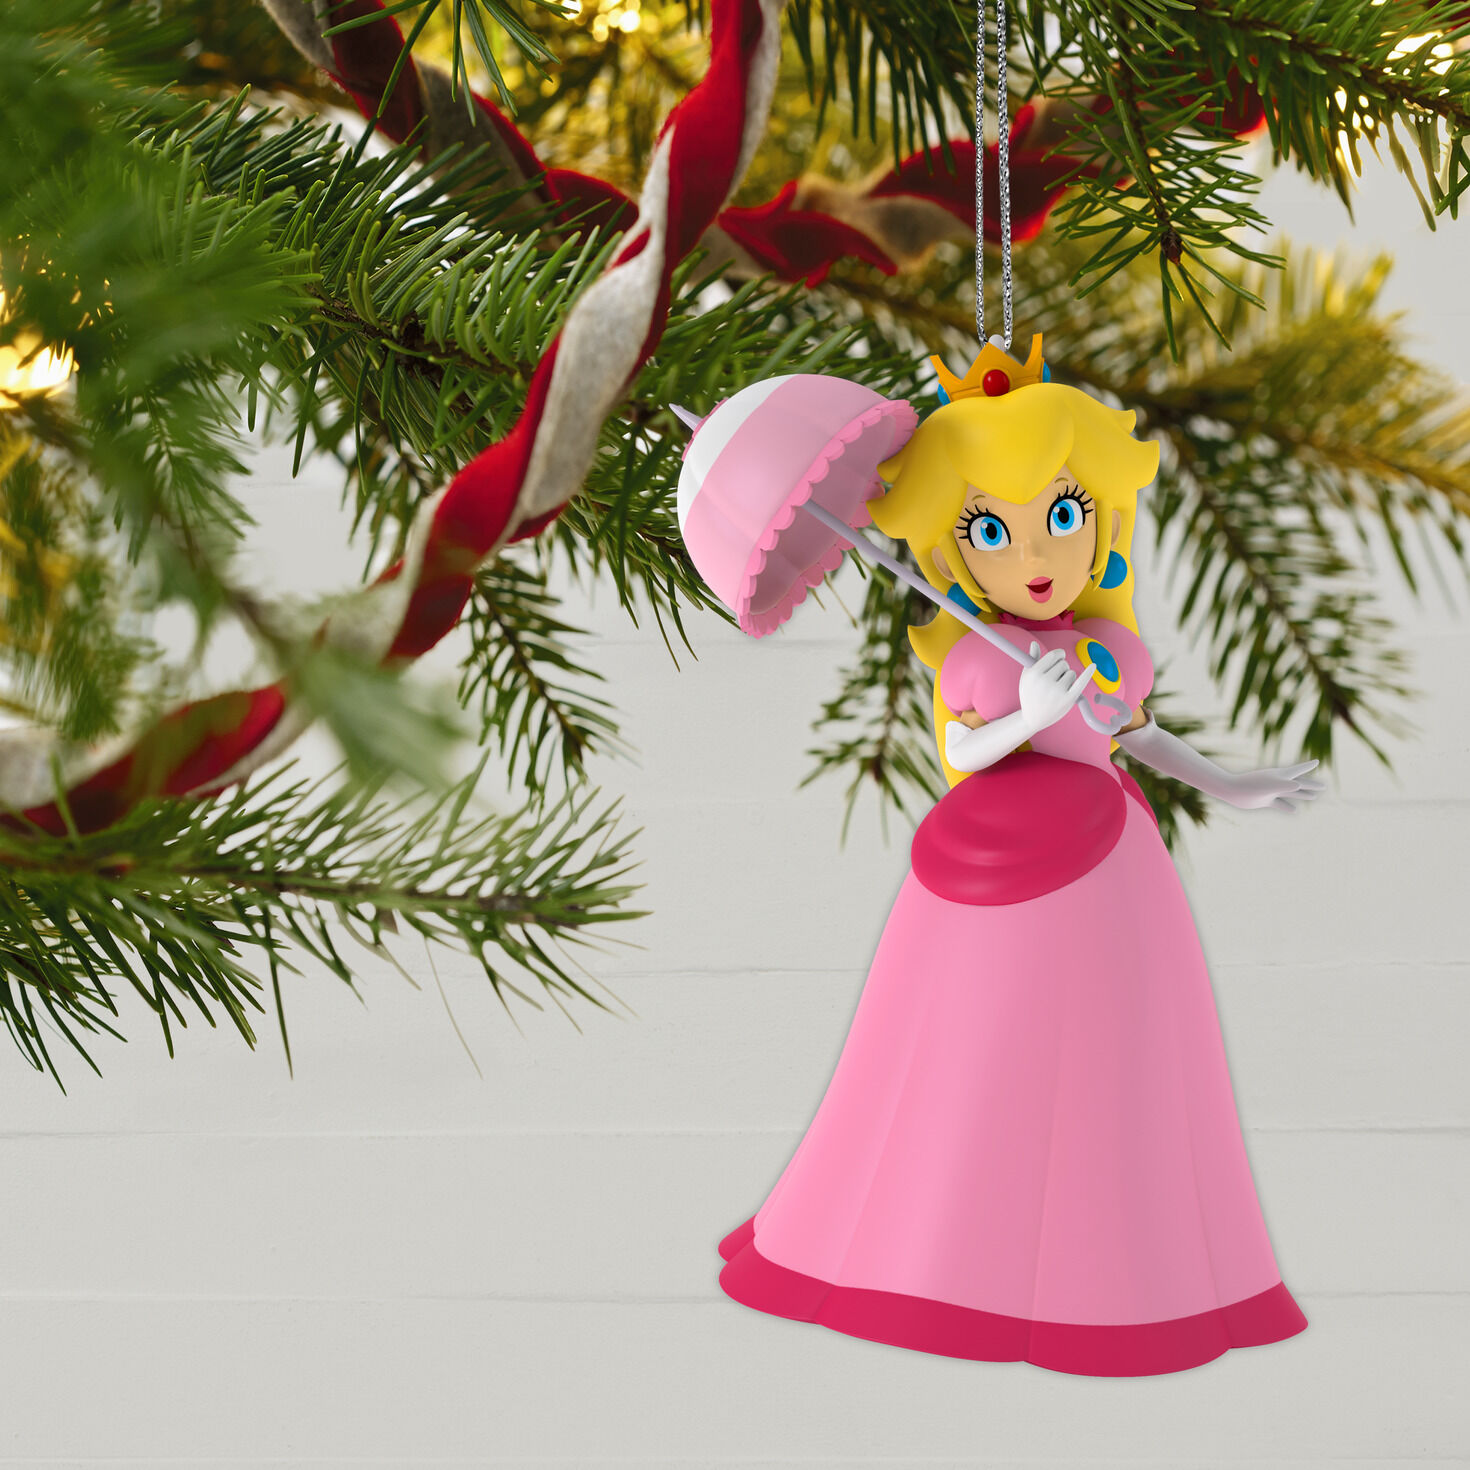 New Disney Aladdin and Magic Flying Carpet Christmas Ornament